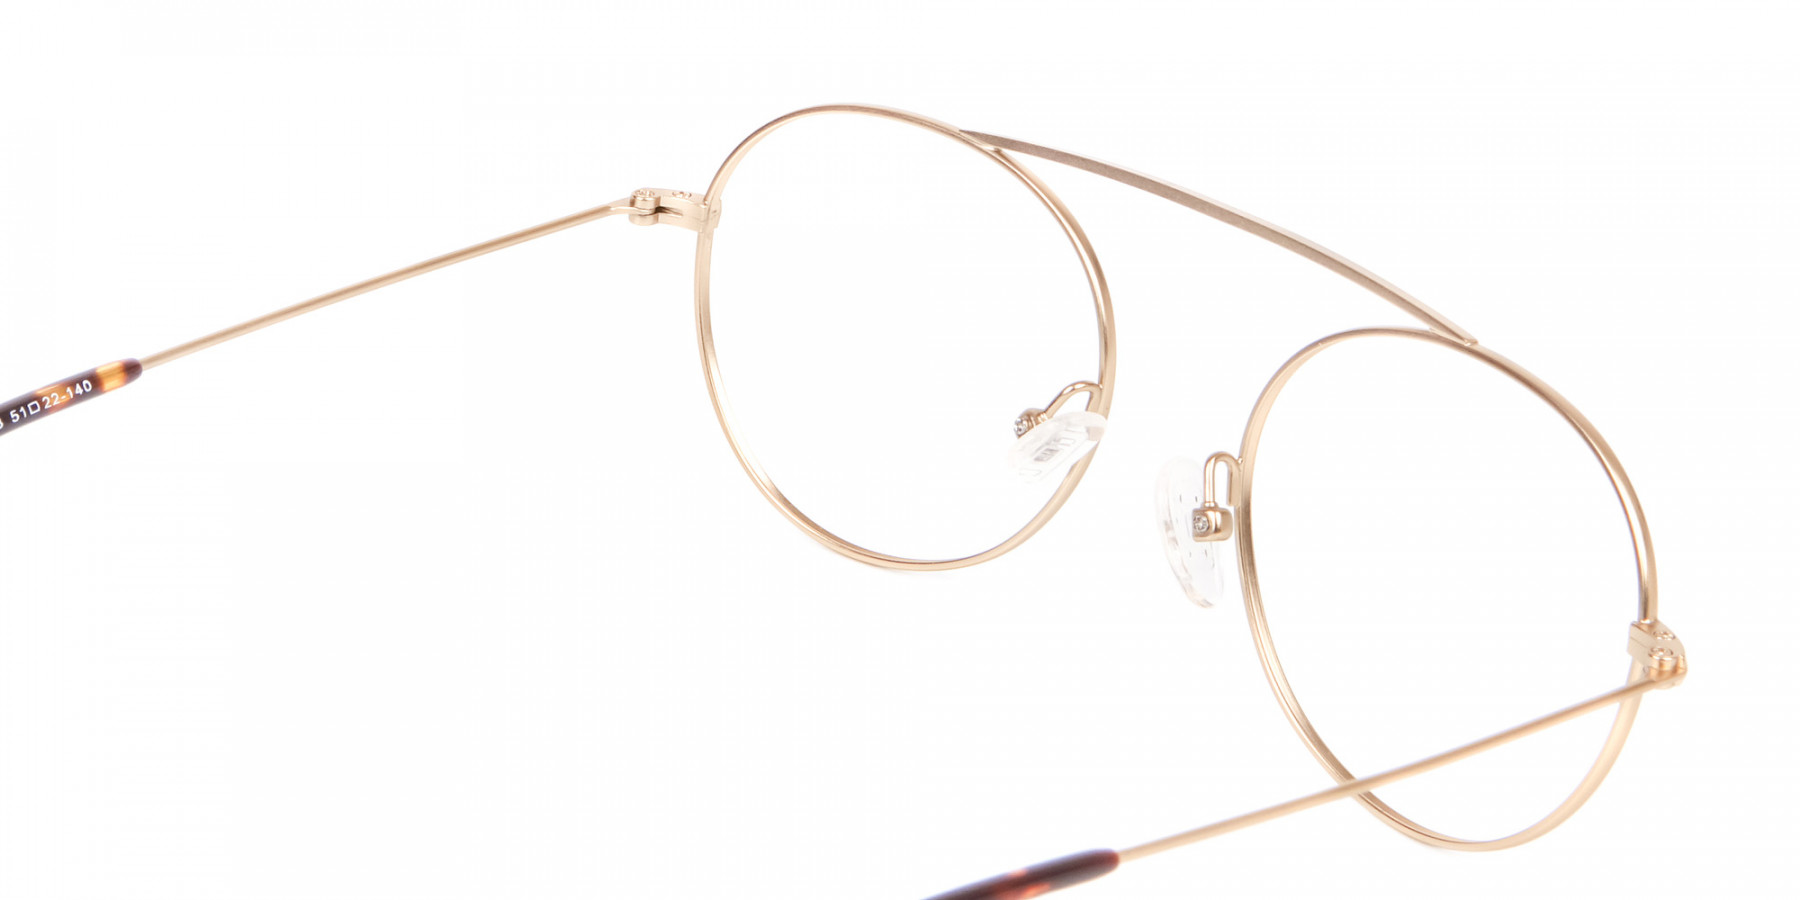 Gold Bridgeless Round Retro Frame Online UK-1